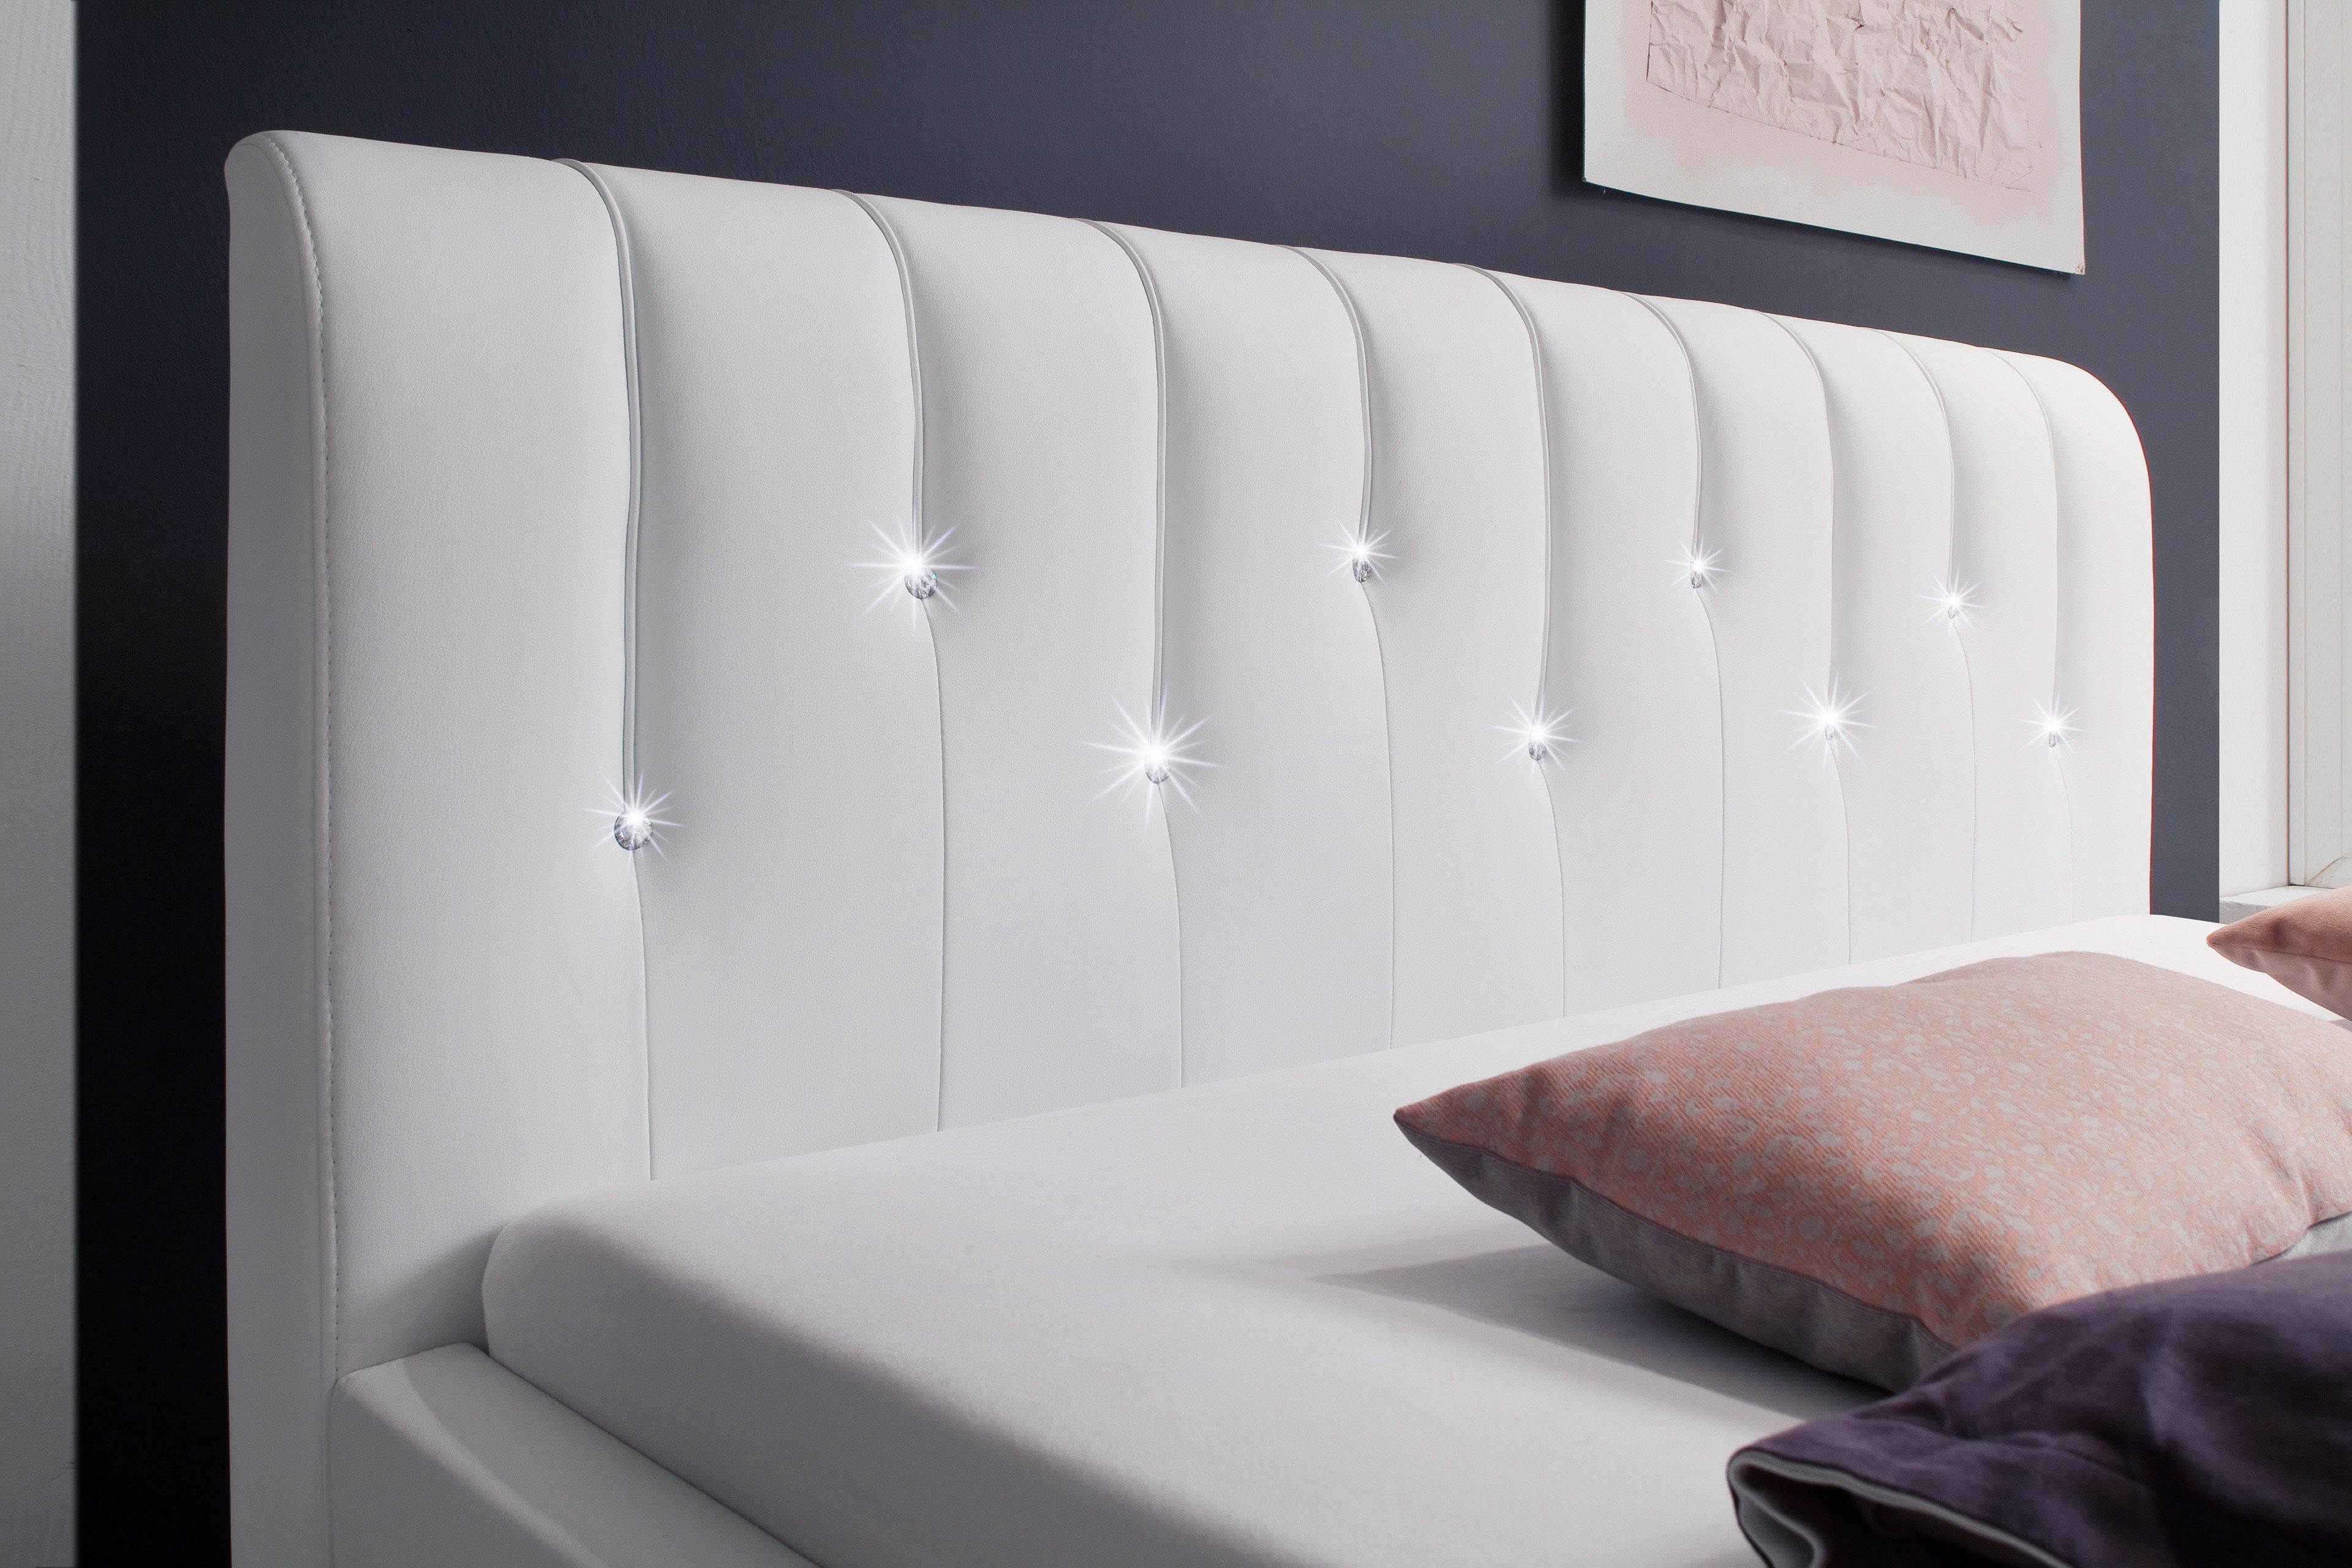 meise polsterbett rapido in kunstleder wei mit swarovski. Black Bedroom Furniture Sets. Home Design Ideas